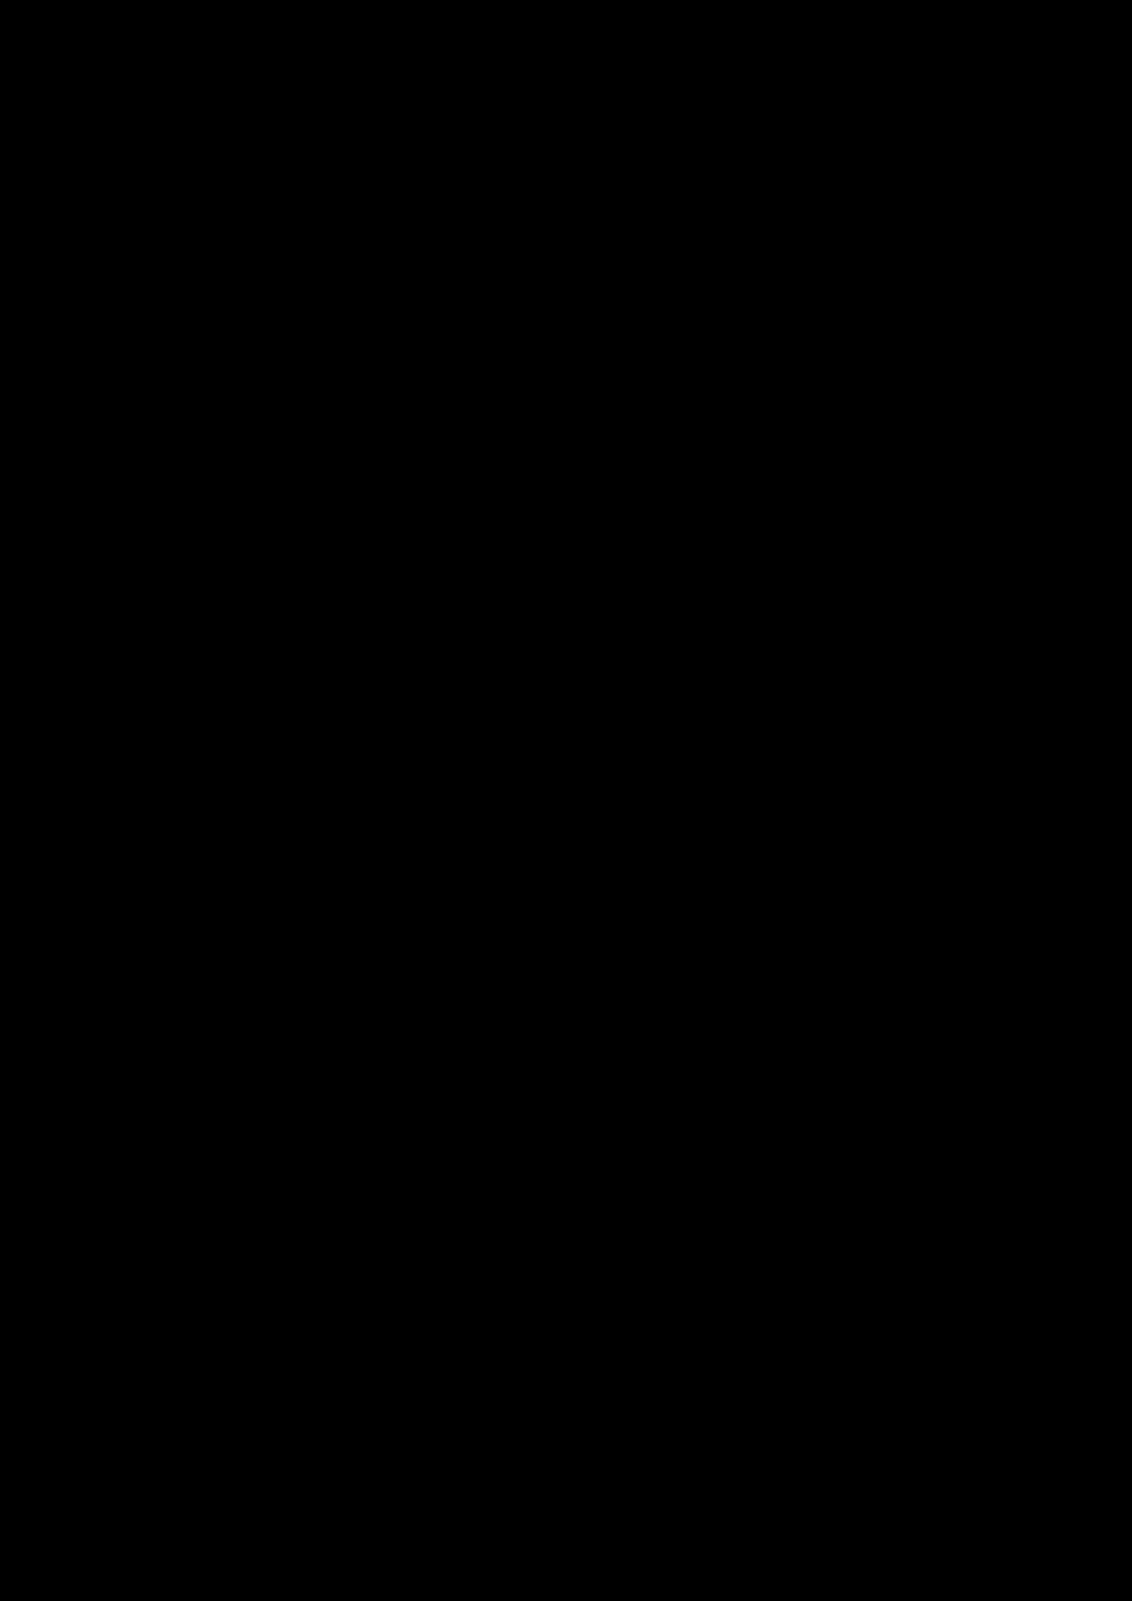 Belyiy sokol slide, Image 66